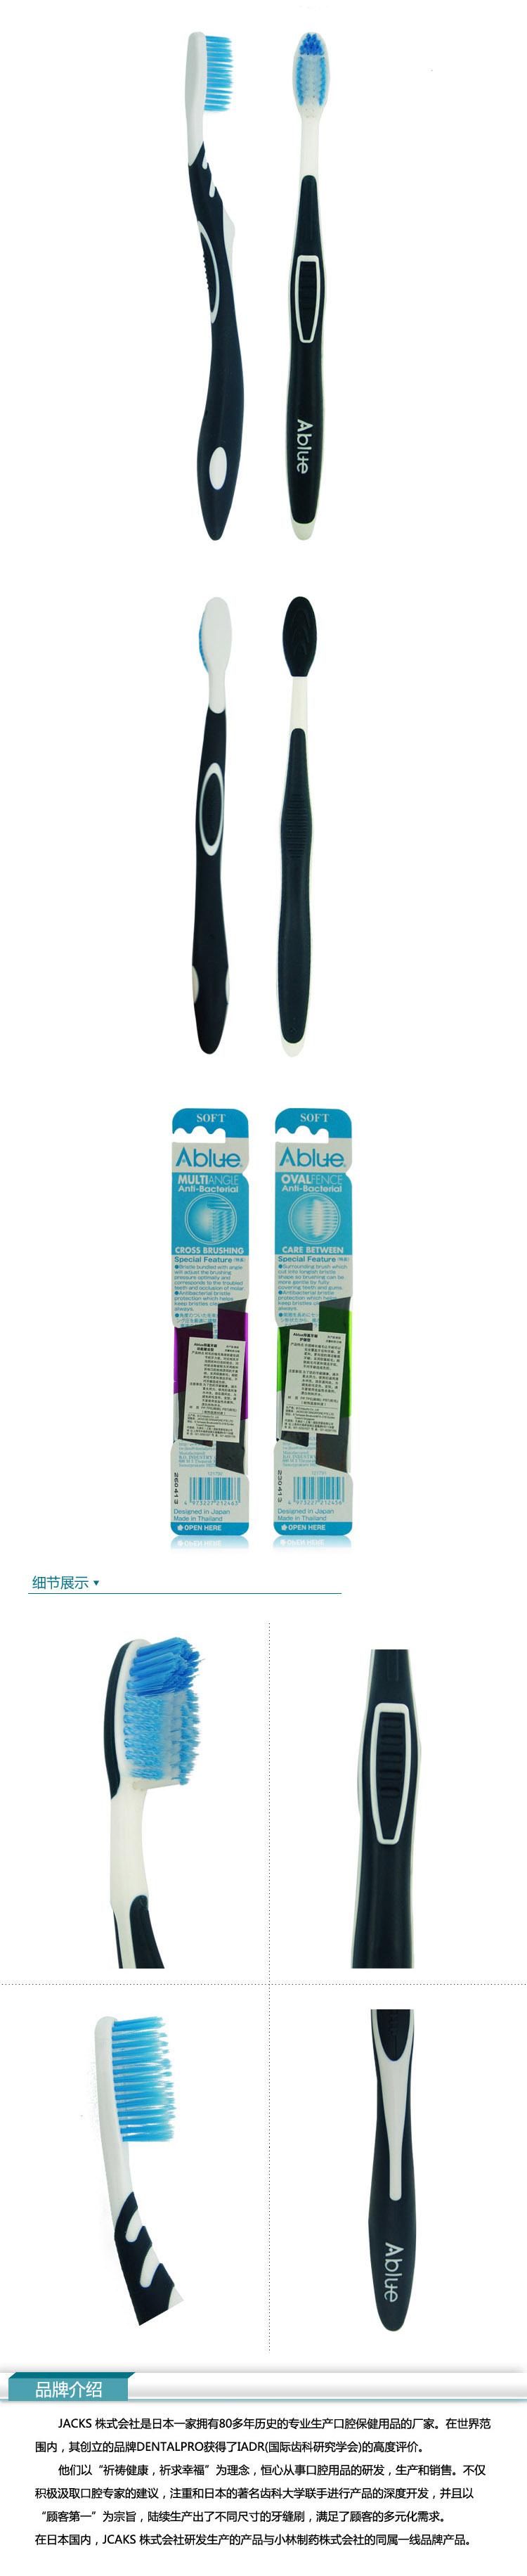 Teeth master / Dante Bo Ablue soft bristle toothbrush antibacterial function Glister type 212463